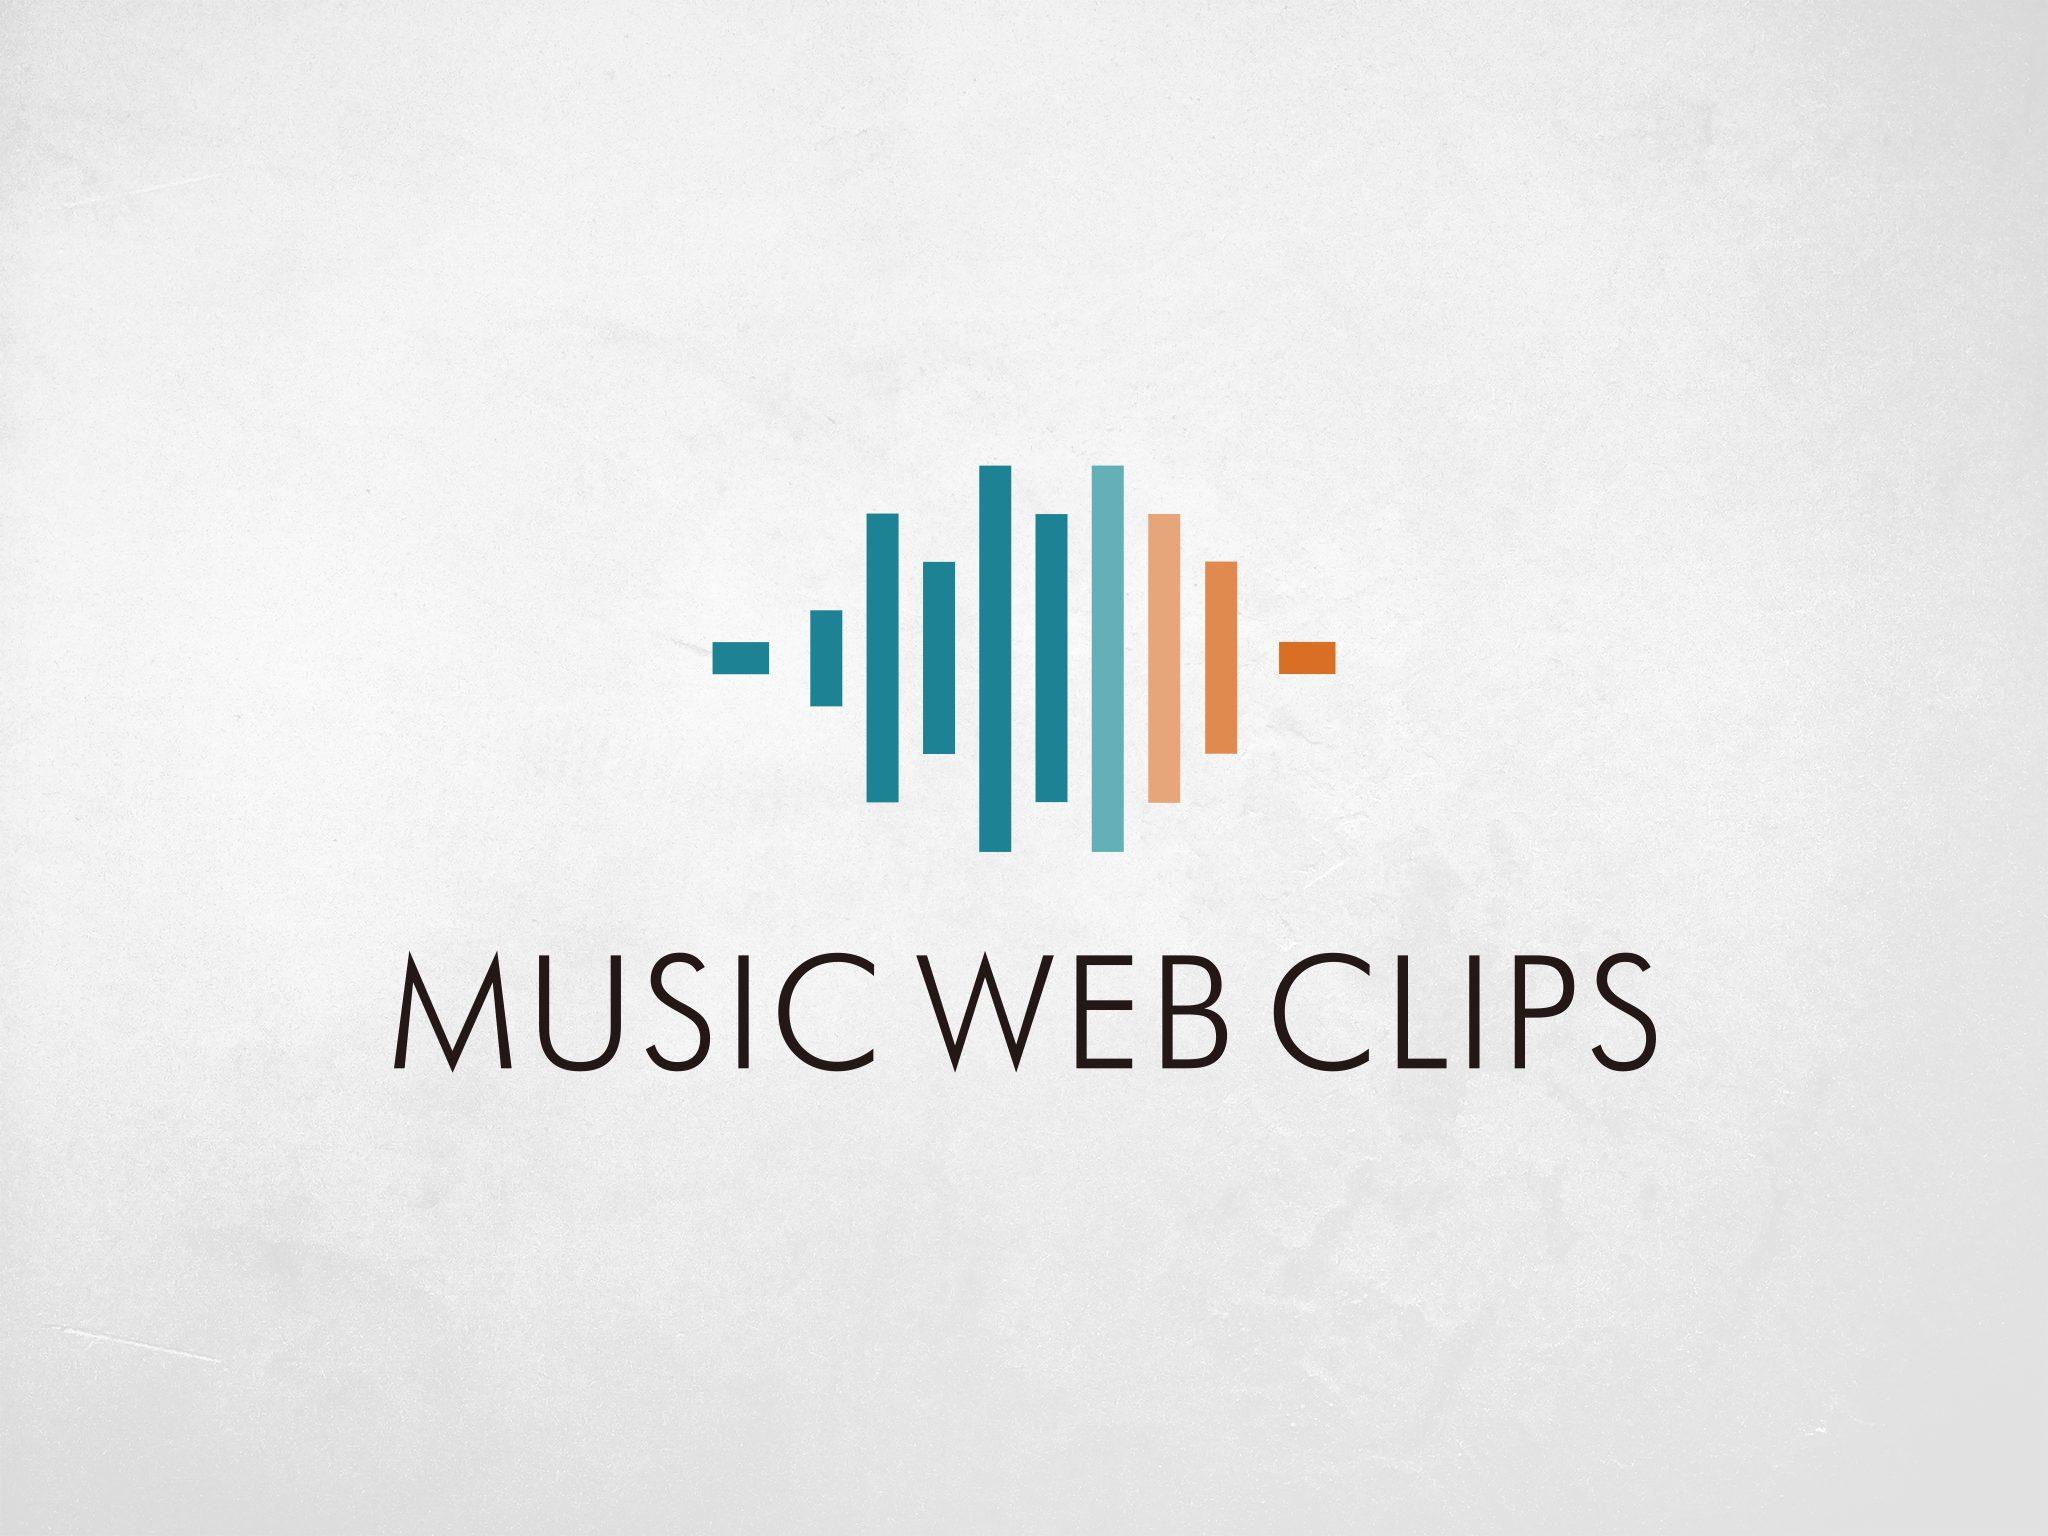 MUSIC WEB CLIPS LOGO